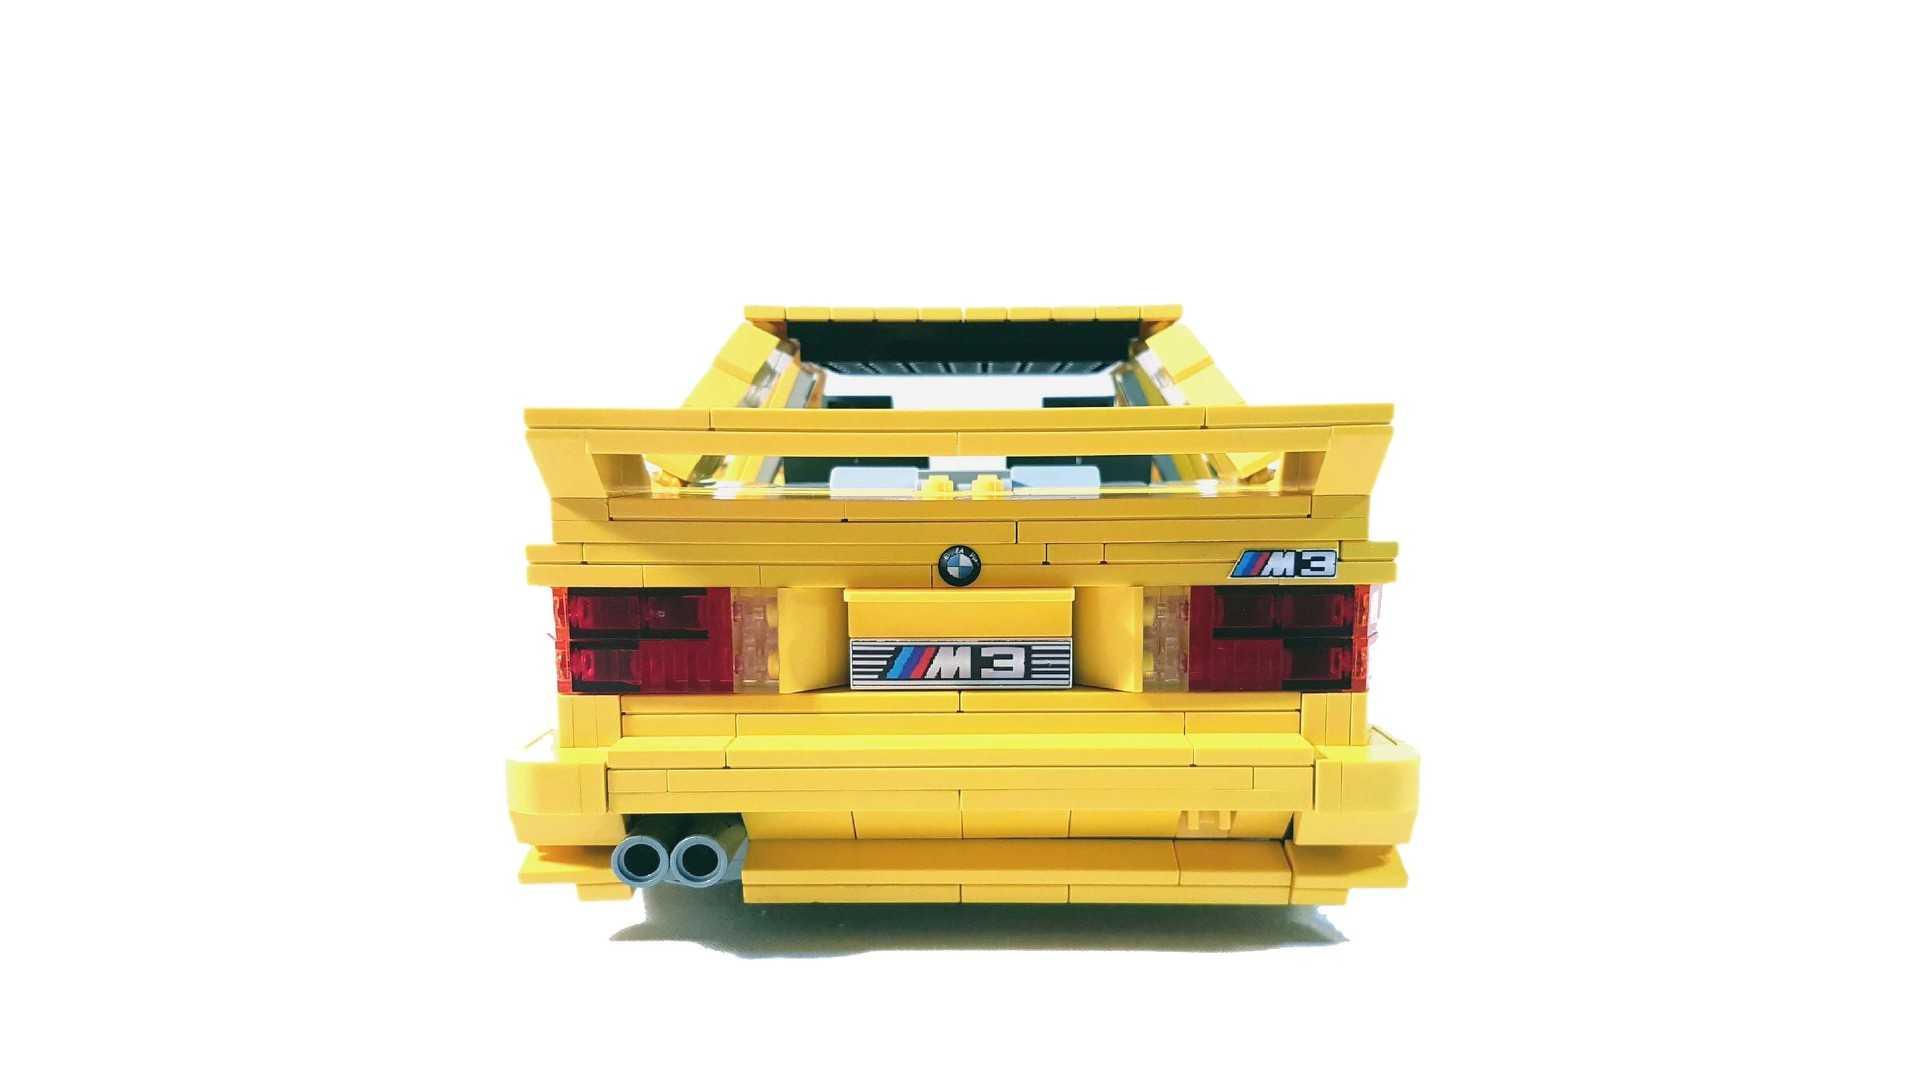 BMW E30 M3 Lego Ideas (7)